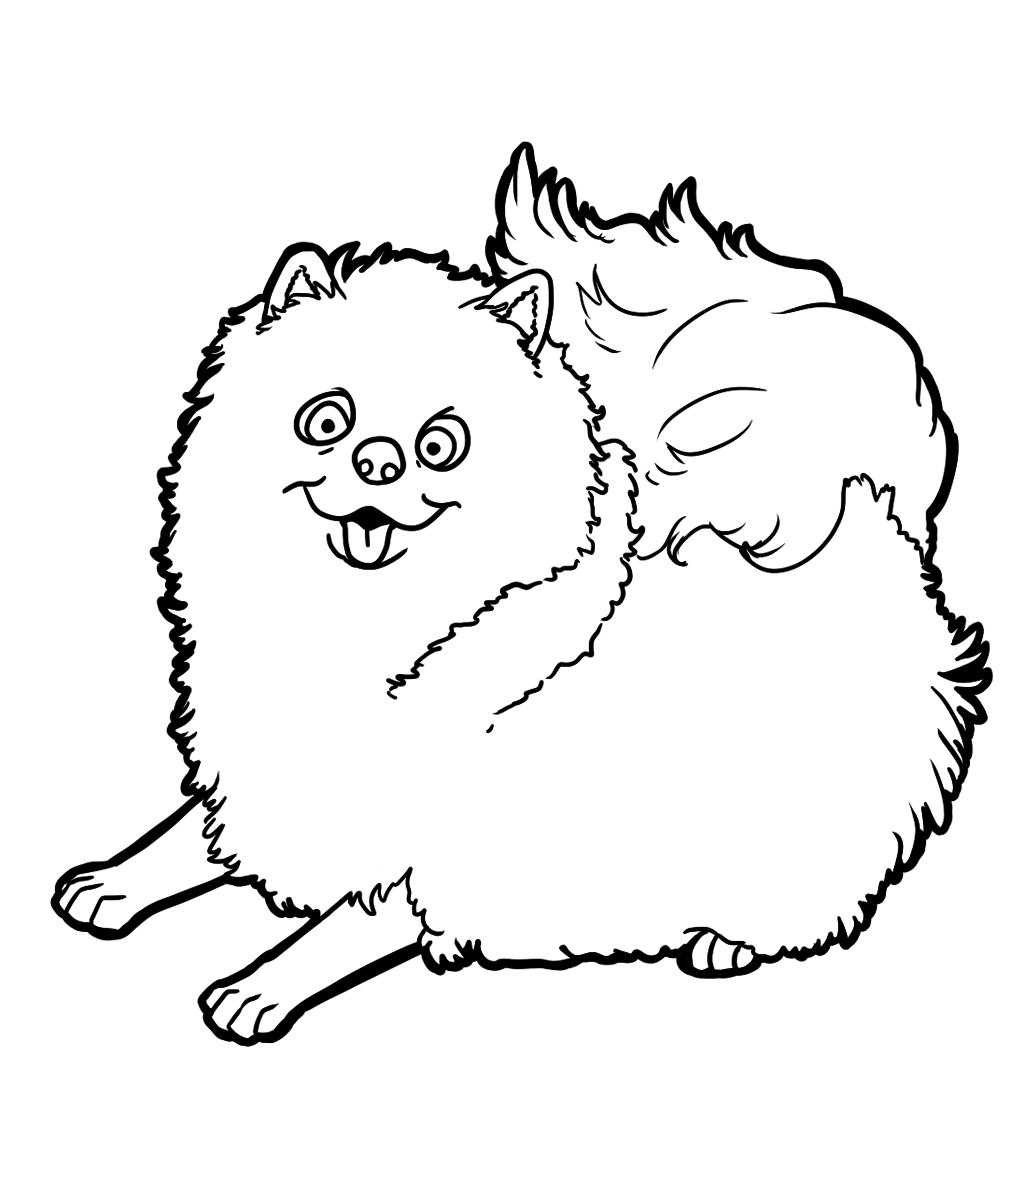 Pomeranian Coloring Pages Az Coloring Pages Pomeranian Coloring Pages